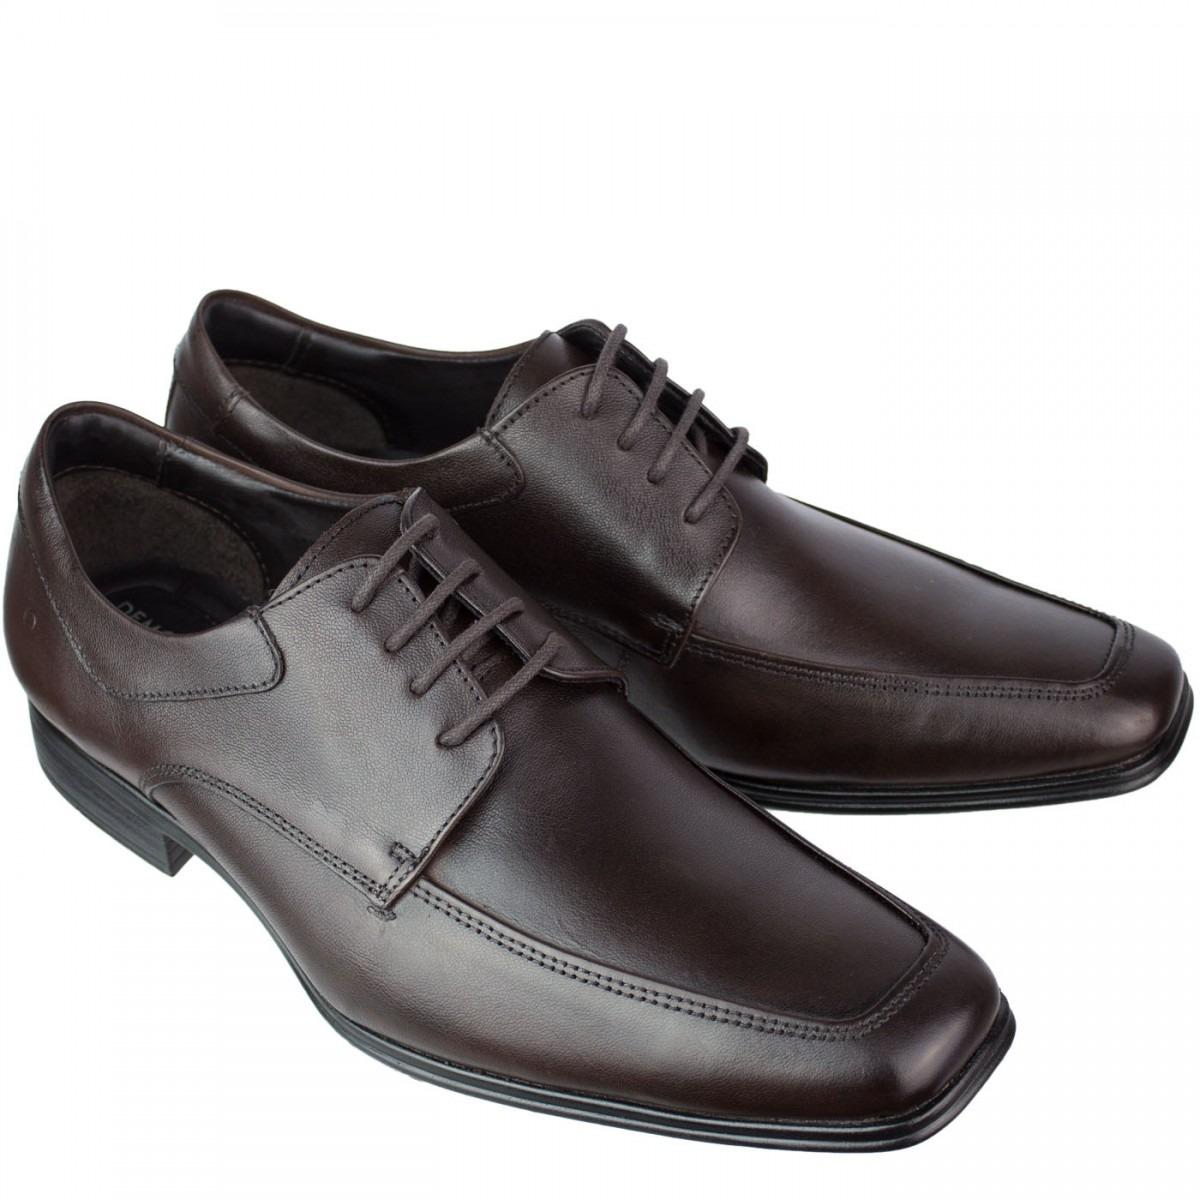 37d81b359 sapato social masculino democrata 028111 couro cadarço. Carregando zoom.